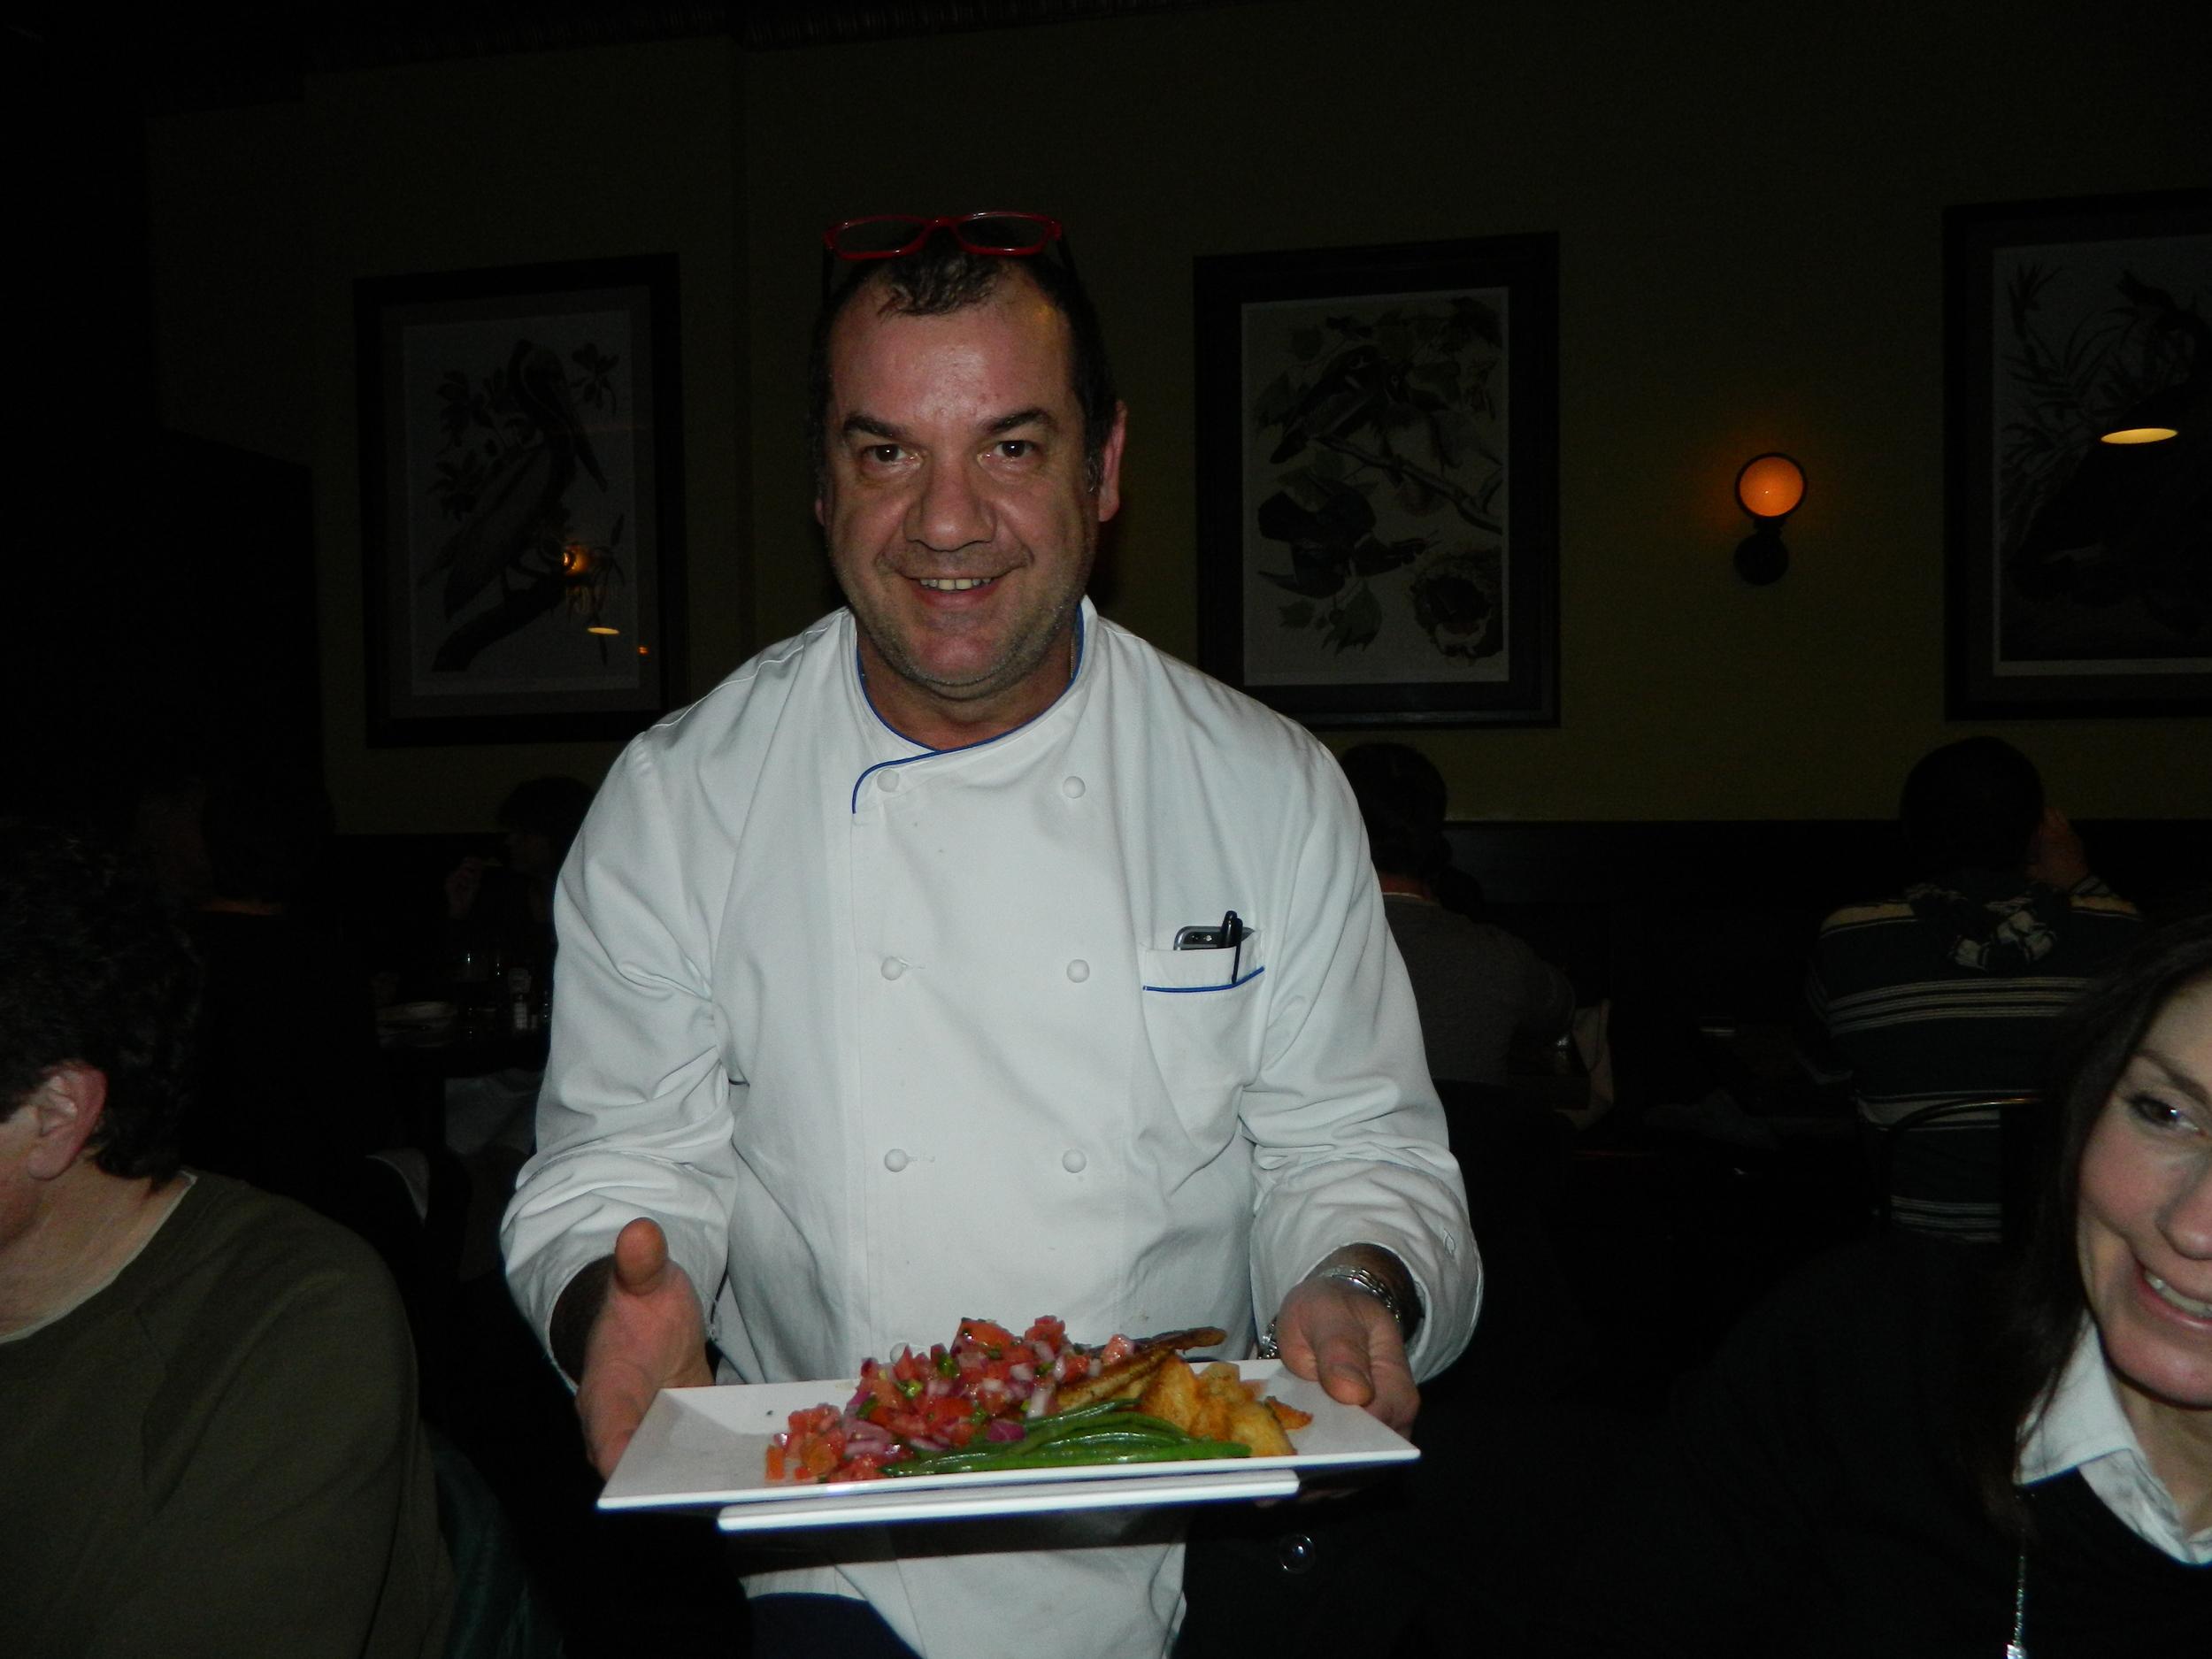 Owner and Executive Chef Nino Antuzzi presents blackened catfish.